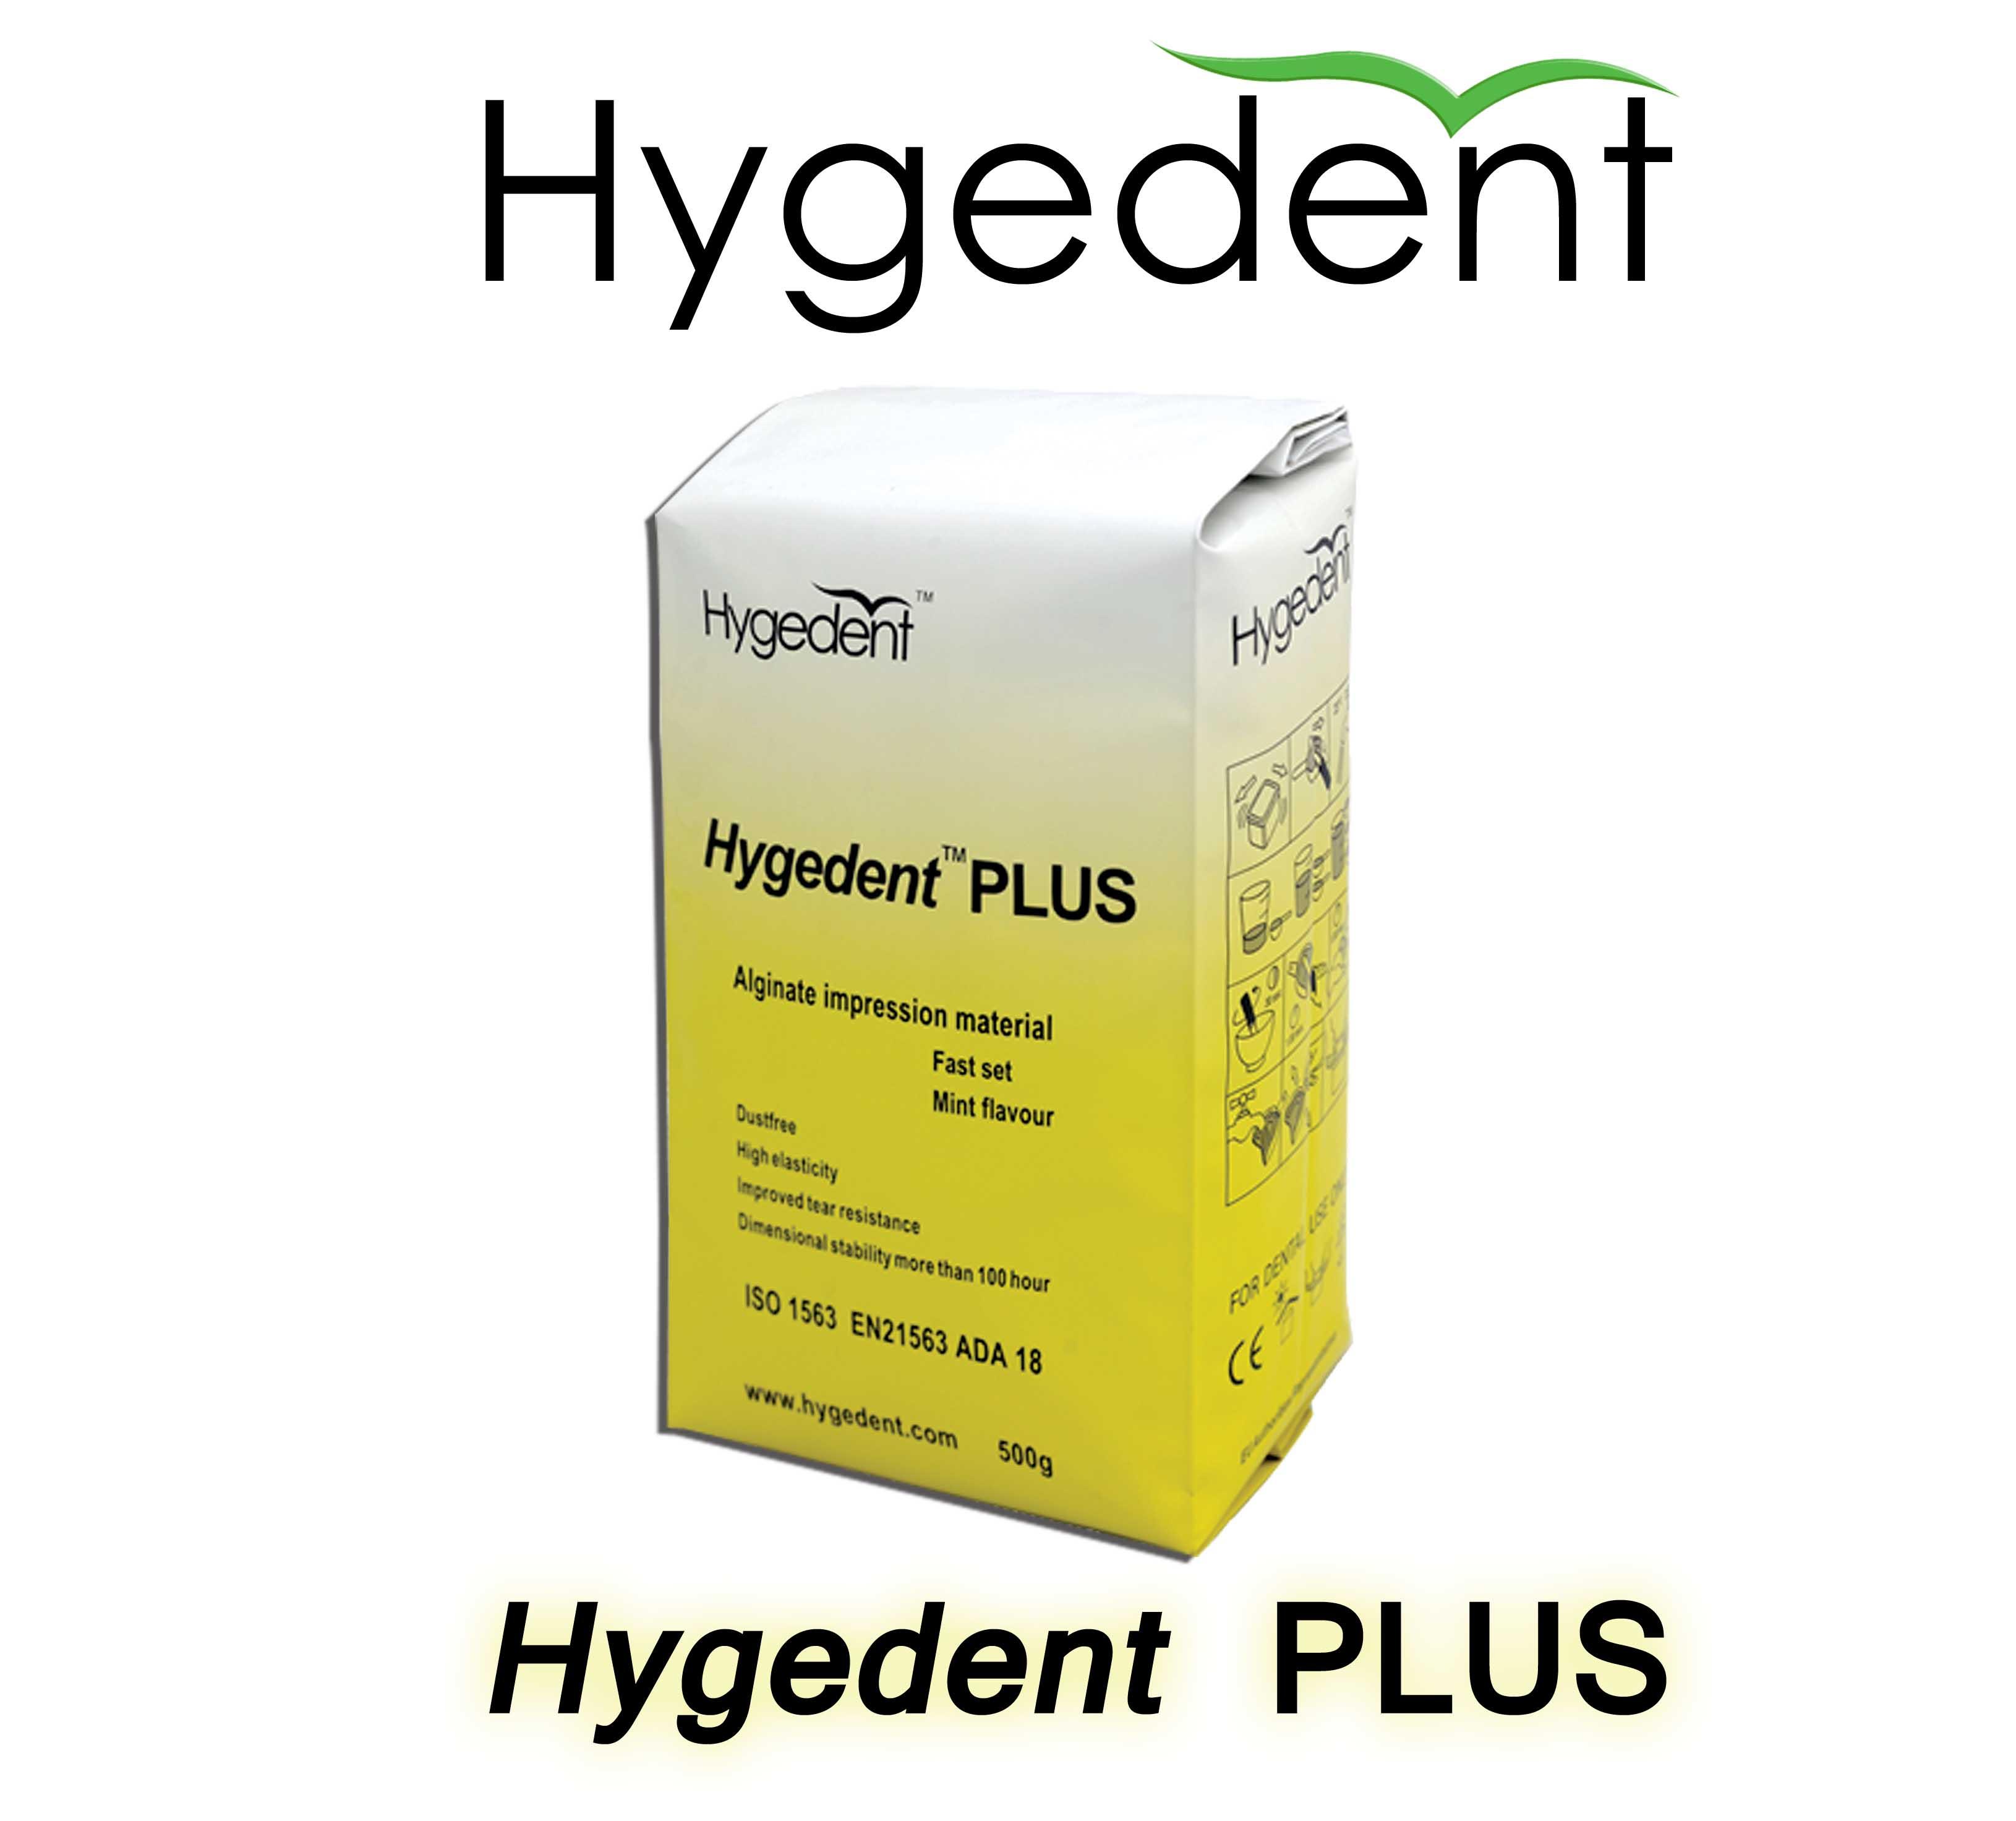 Hygedent Plus